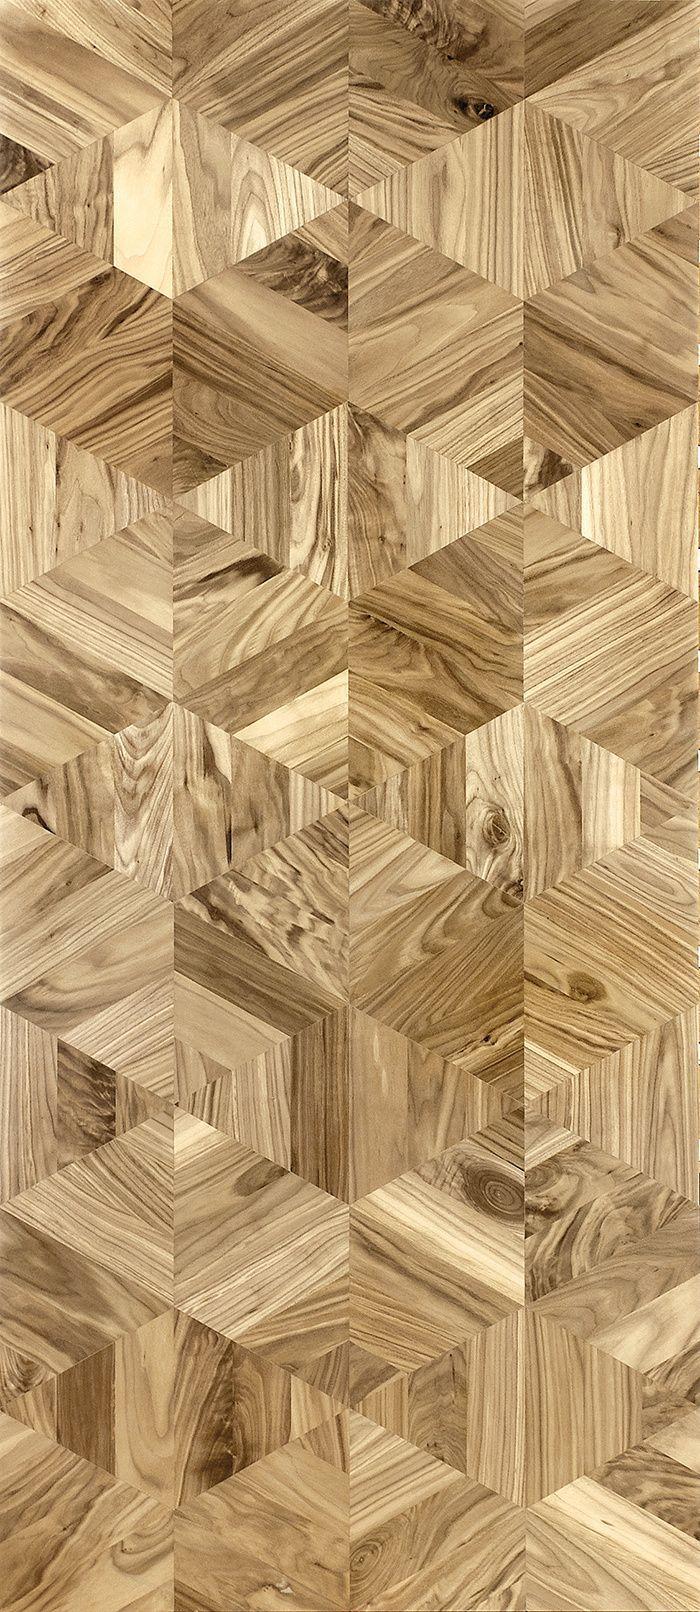 parquets originaux floor texture pattern. Black Bedroom Furniture Sets. Home Design Ideas